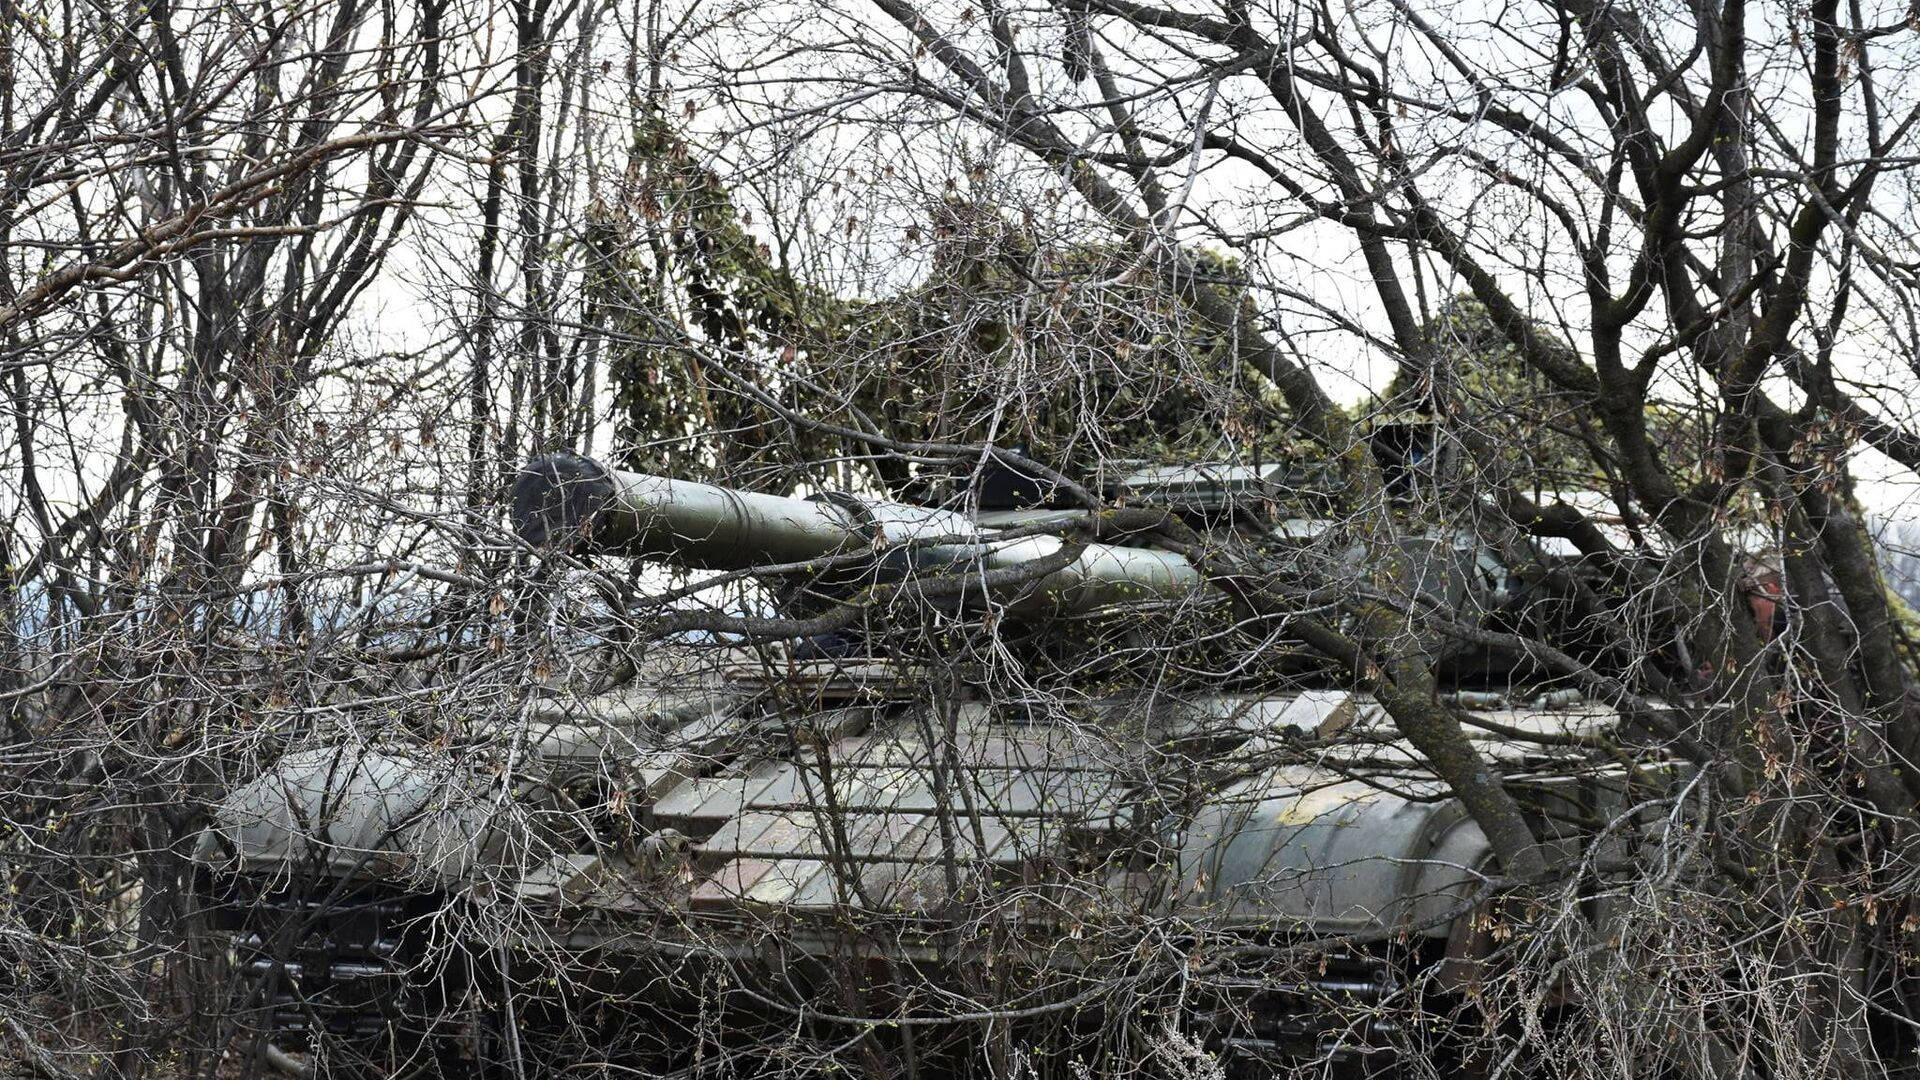 Konflikt zbrojny w Donbasie. - Sputnik Polska, 1920, 17.07.2021